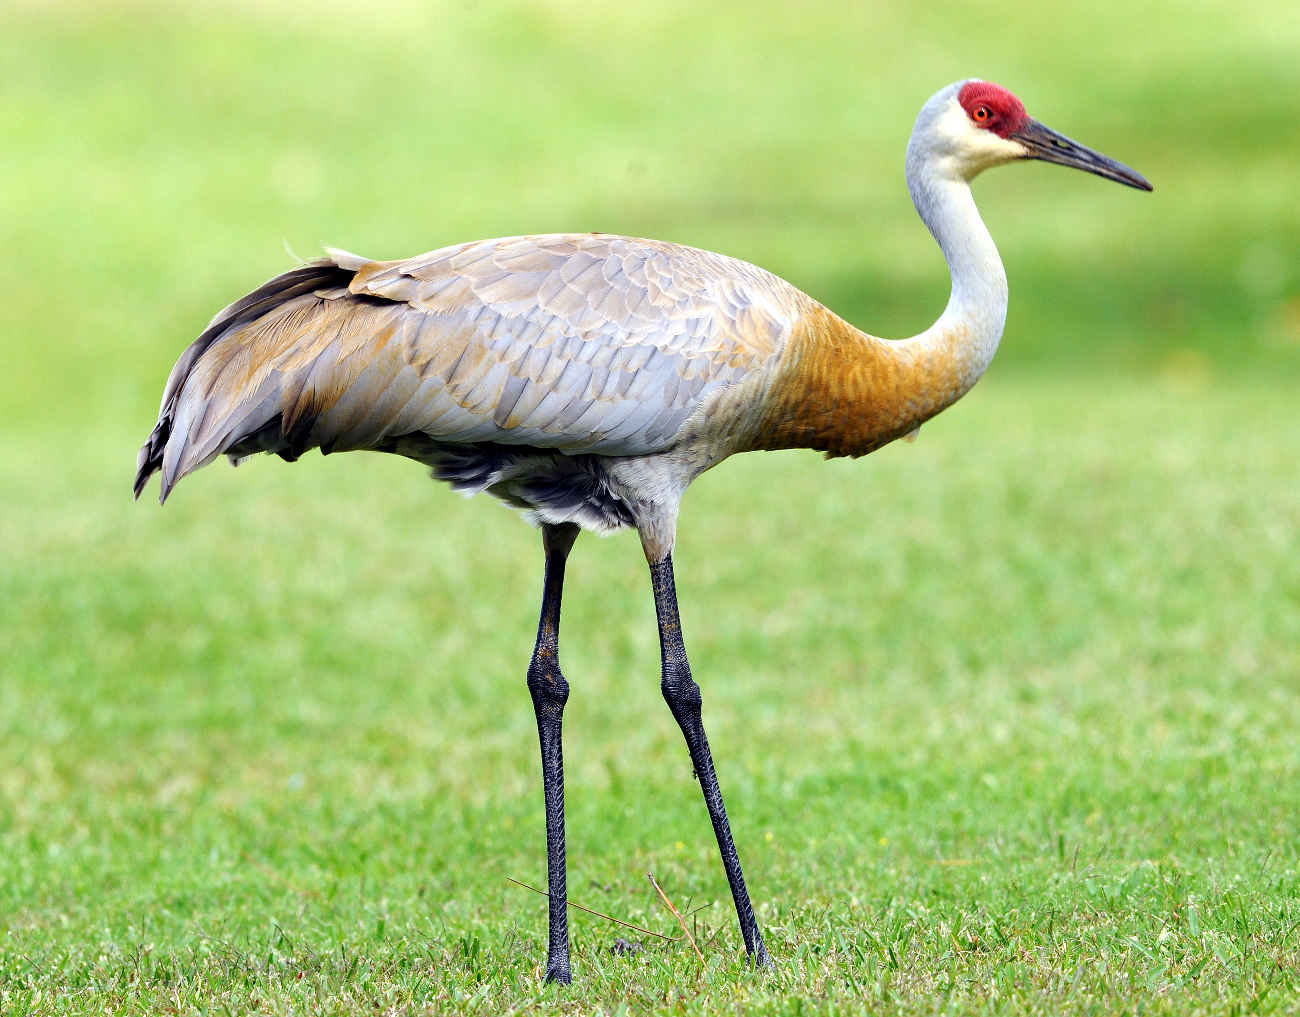 Crane bird images hdcrane